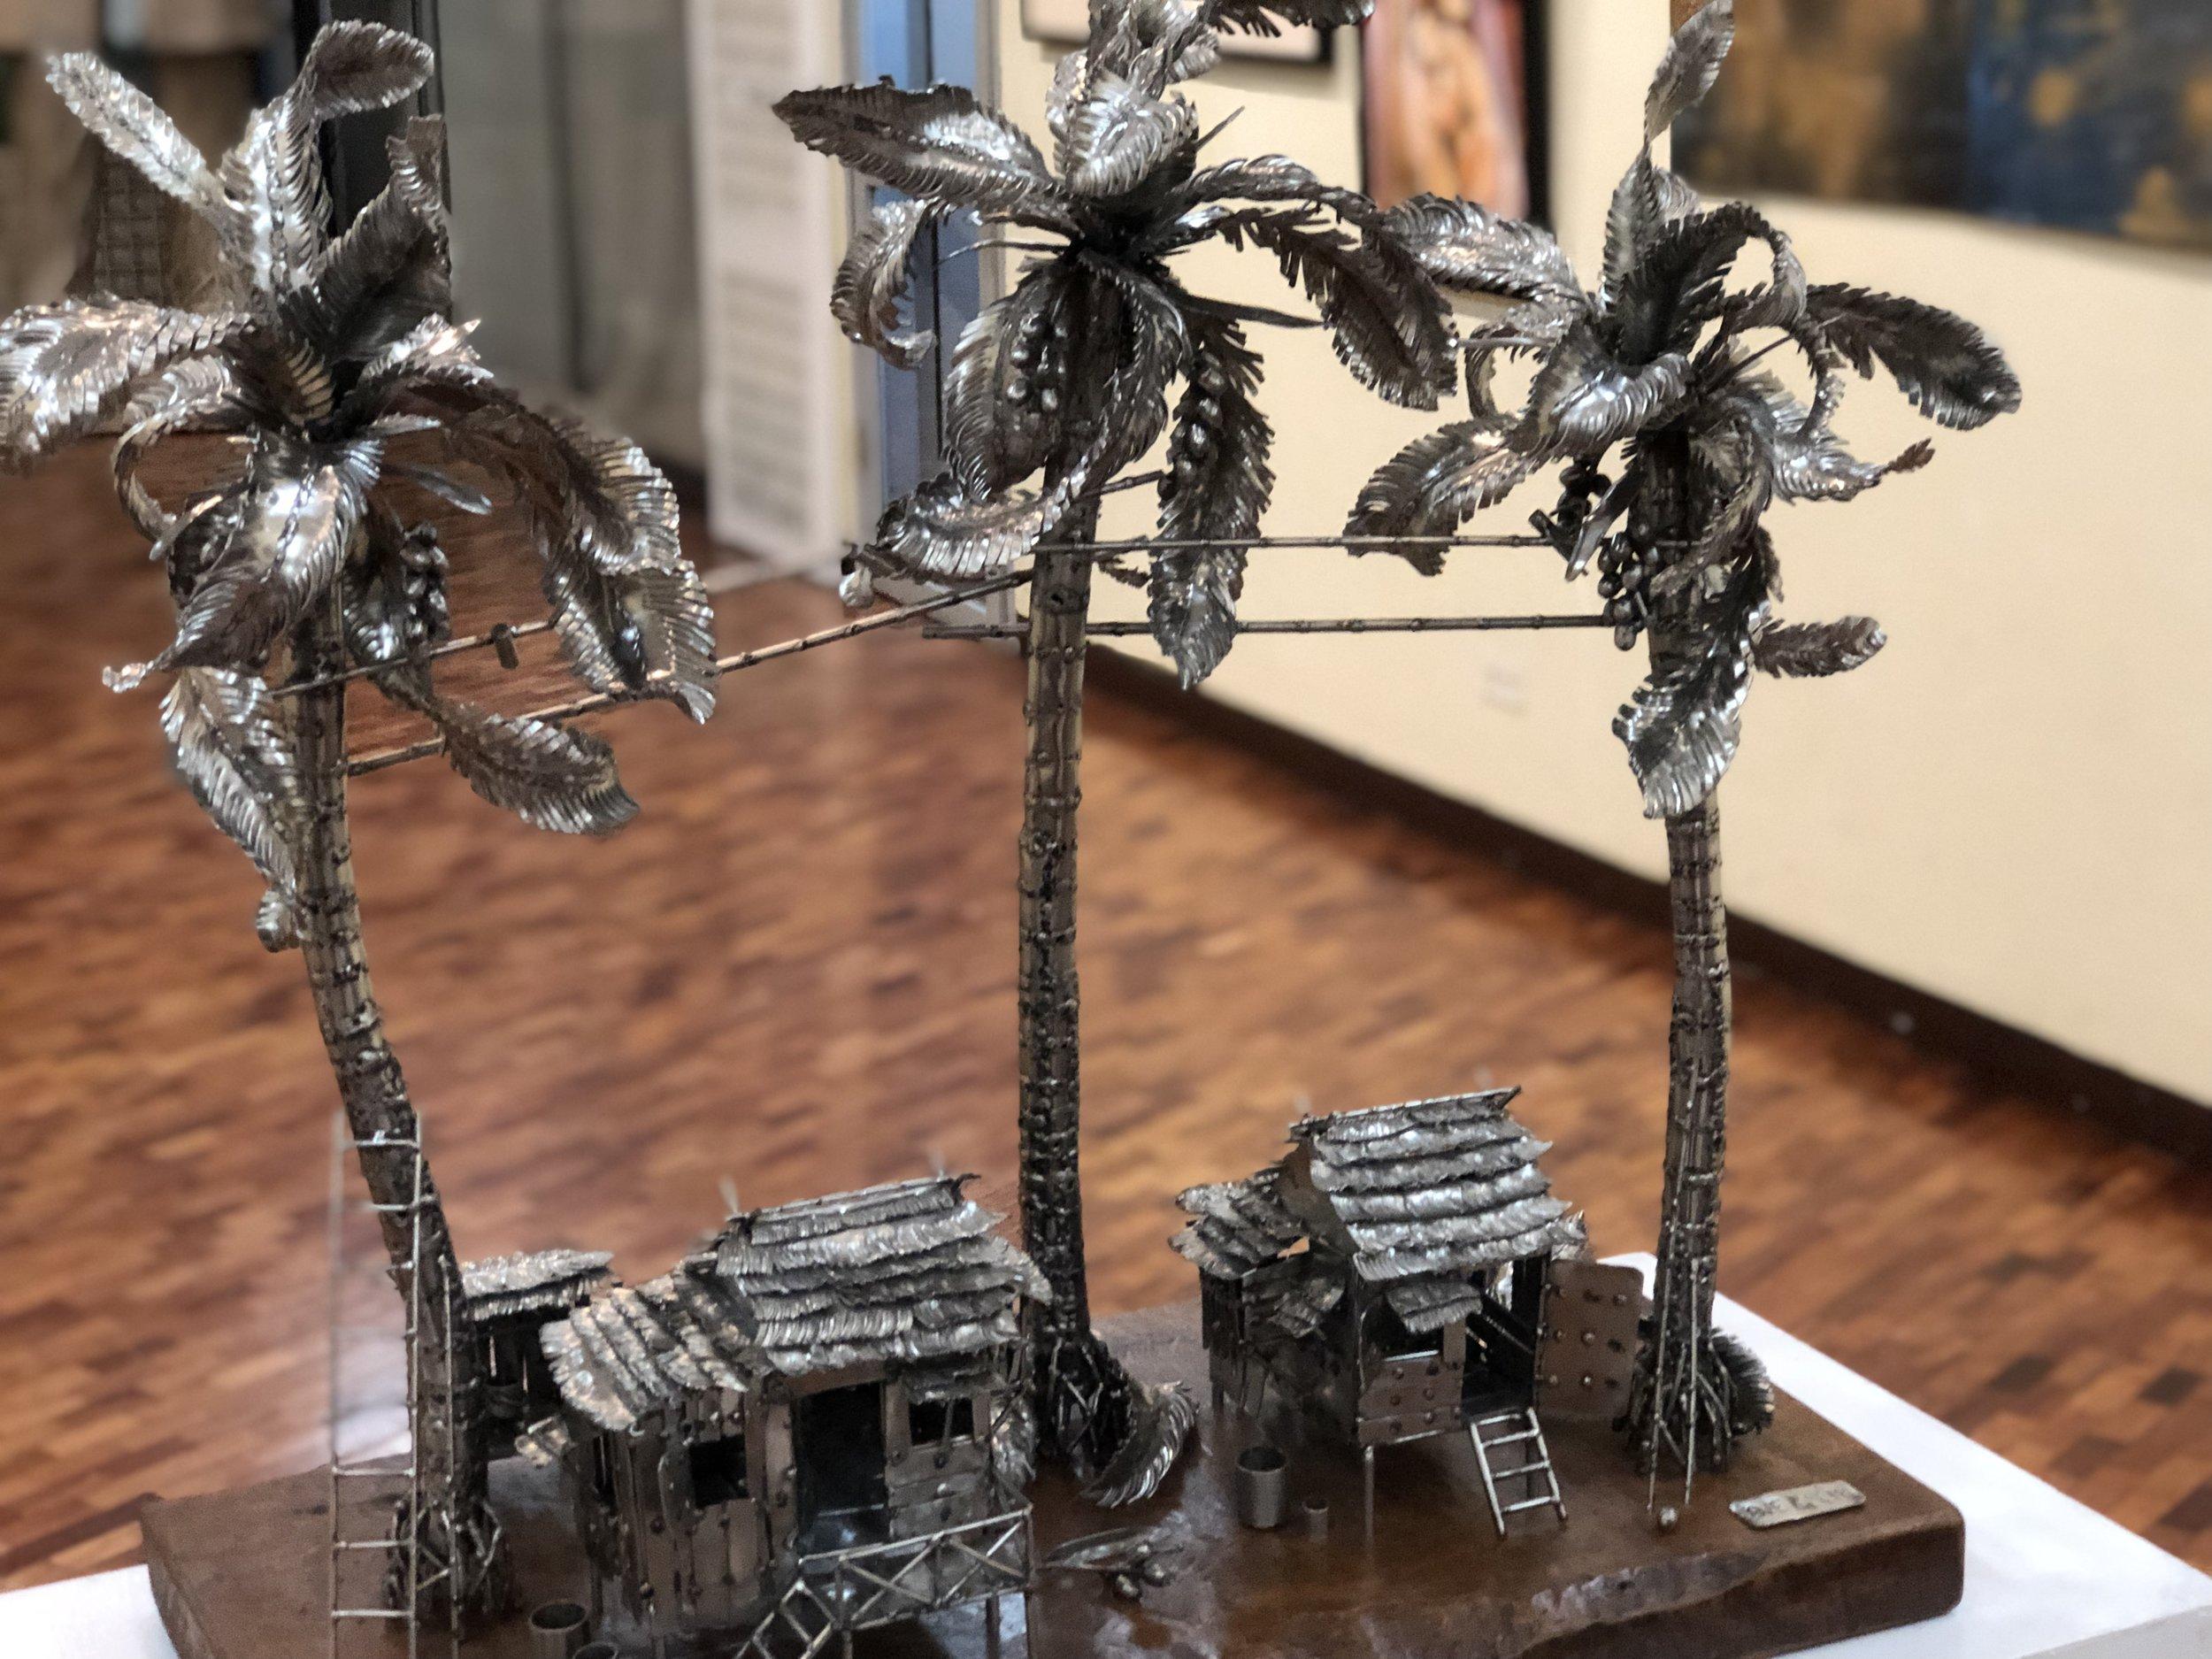 Sculpture by Noel P. Bueza